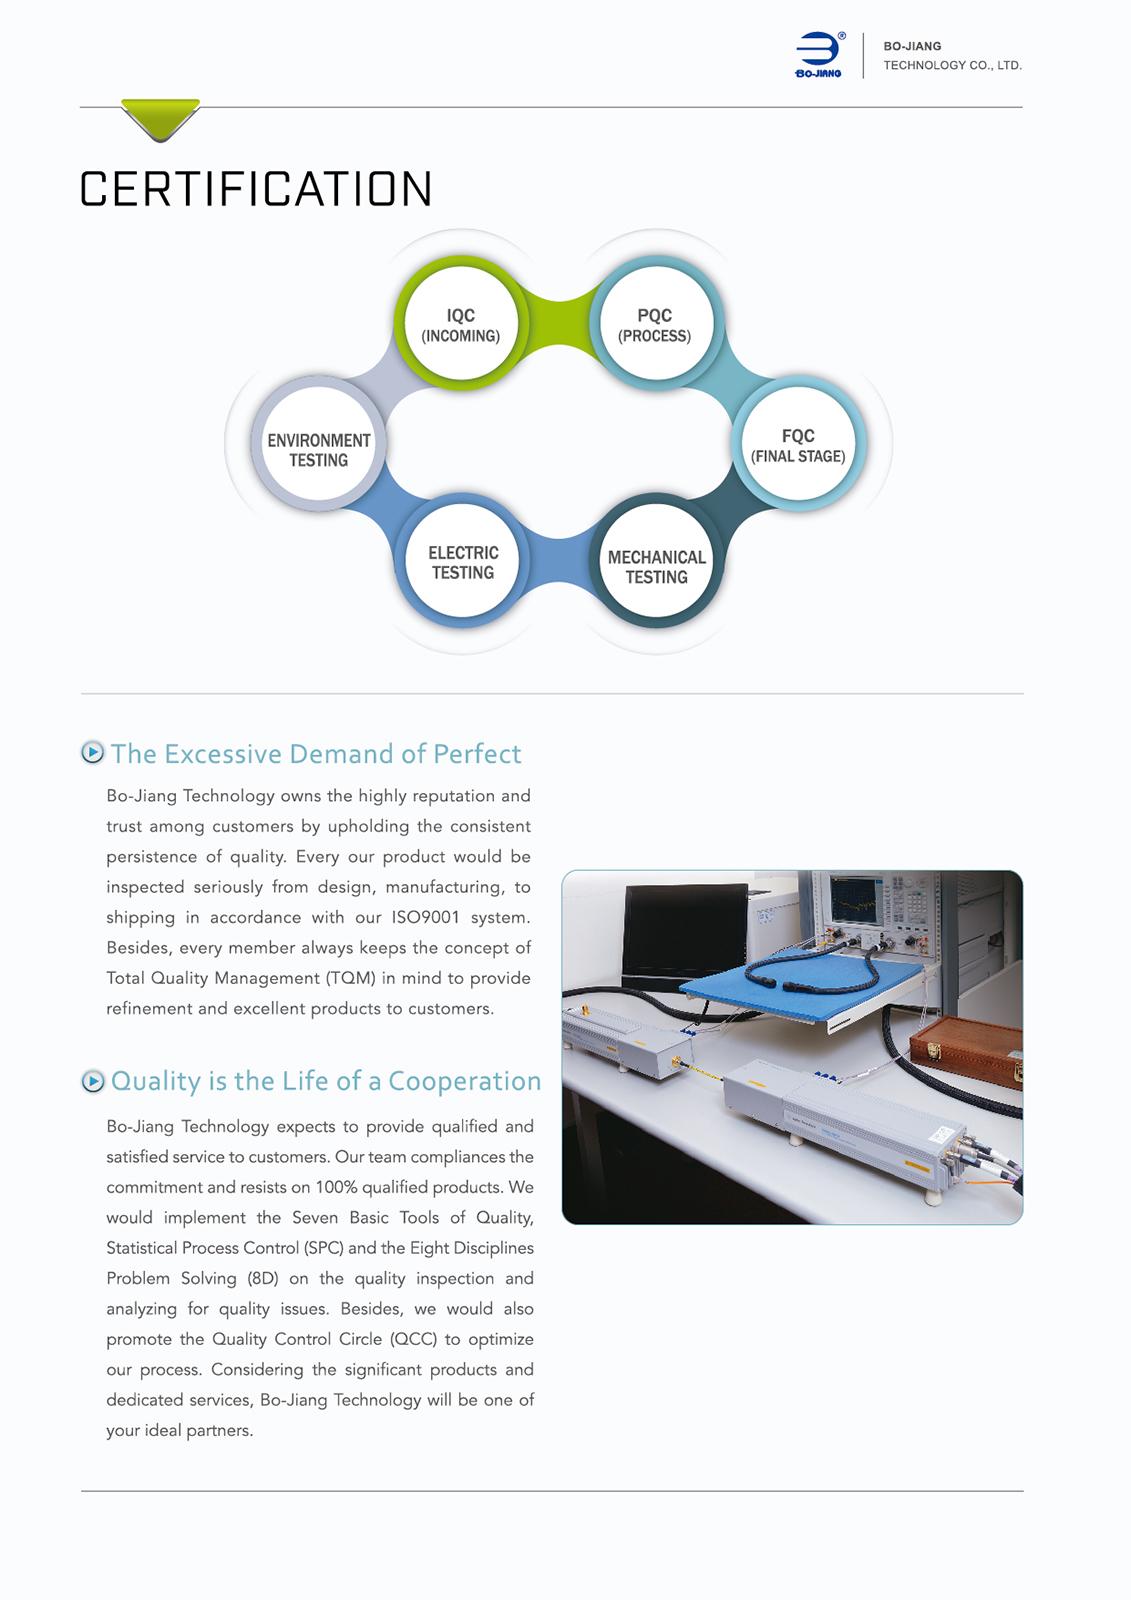 帛江科技certification